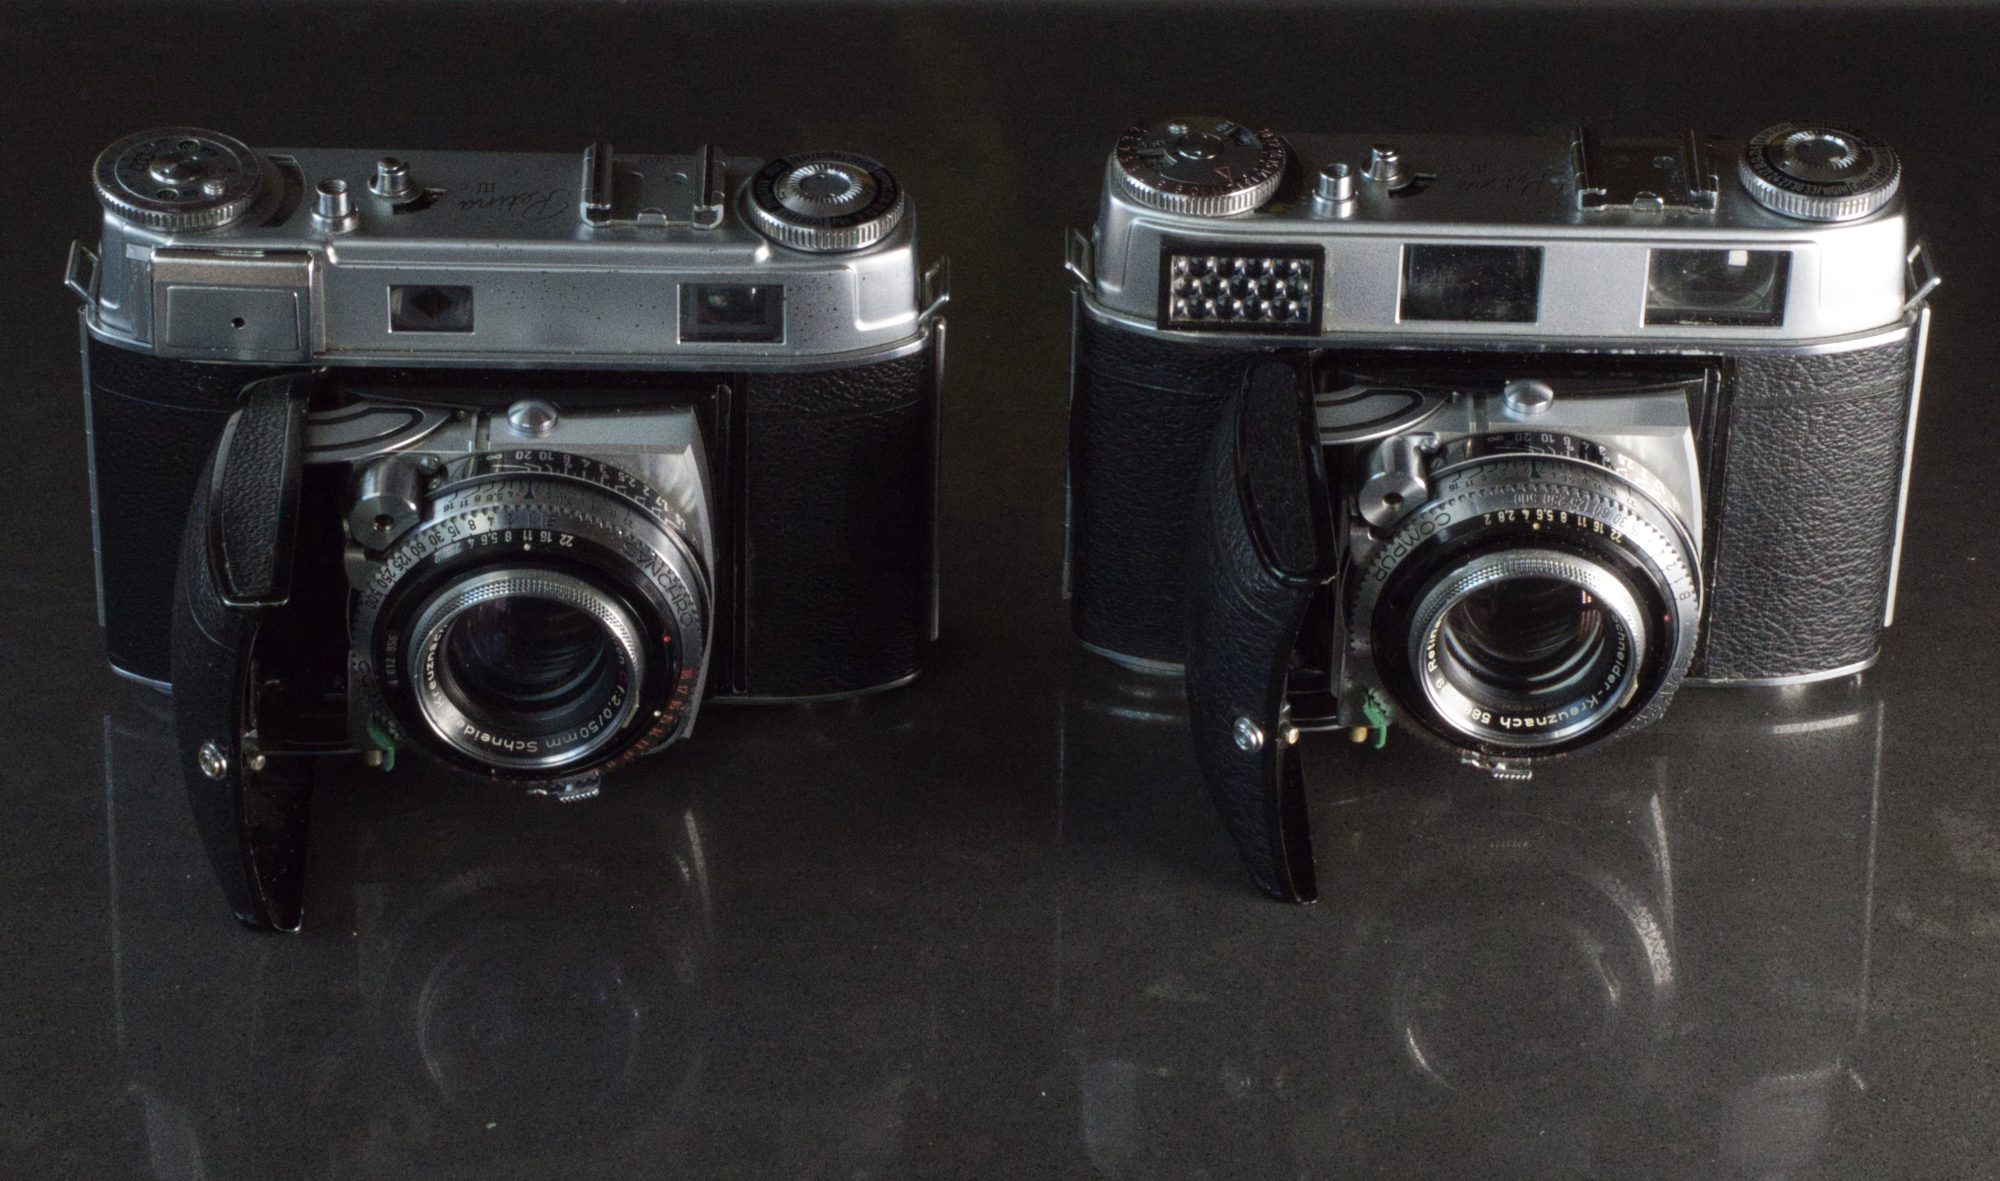 Zweieiige Zwillinge: Retina IIIc und IIIC mit Normalobjektiv Schneider Retina-Xenon 2/50mm